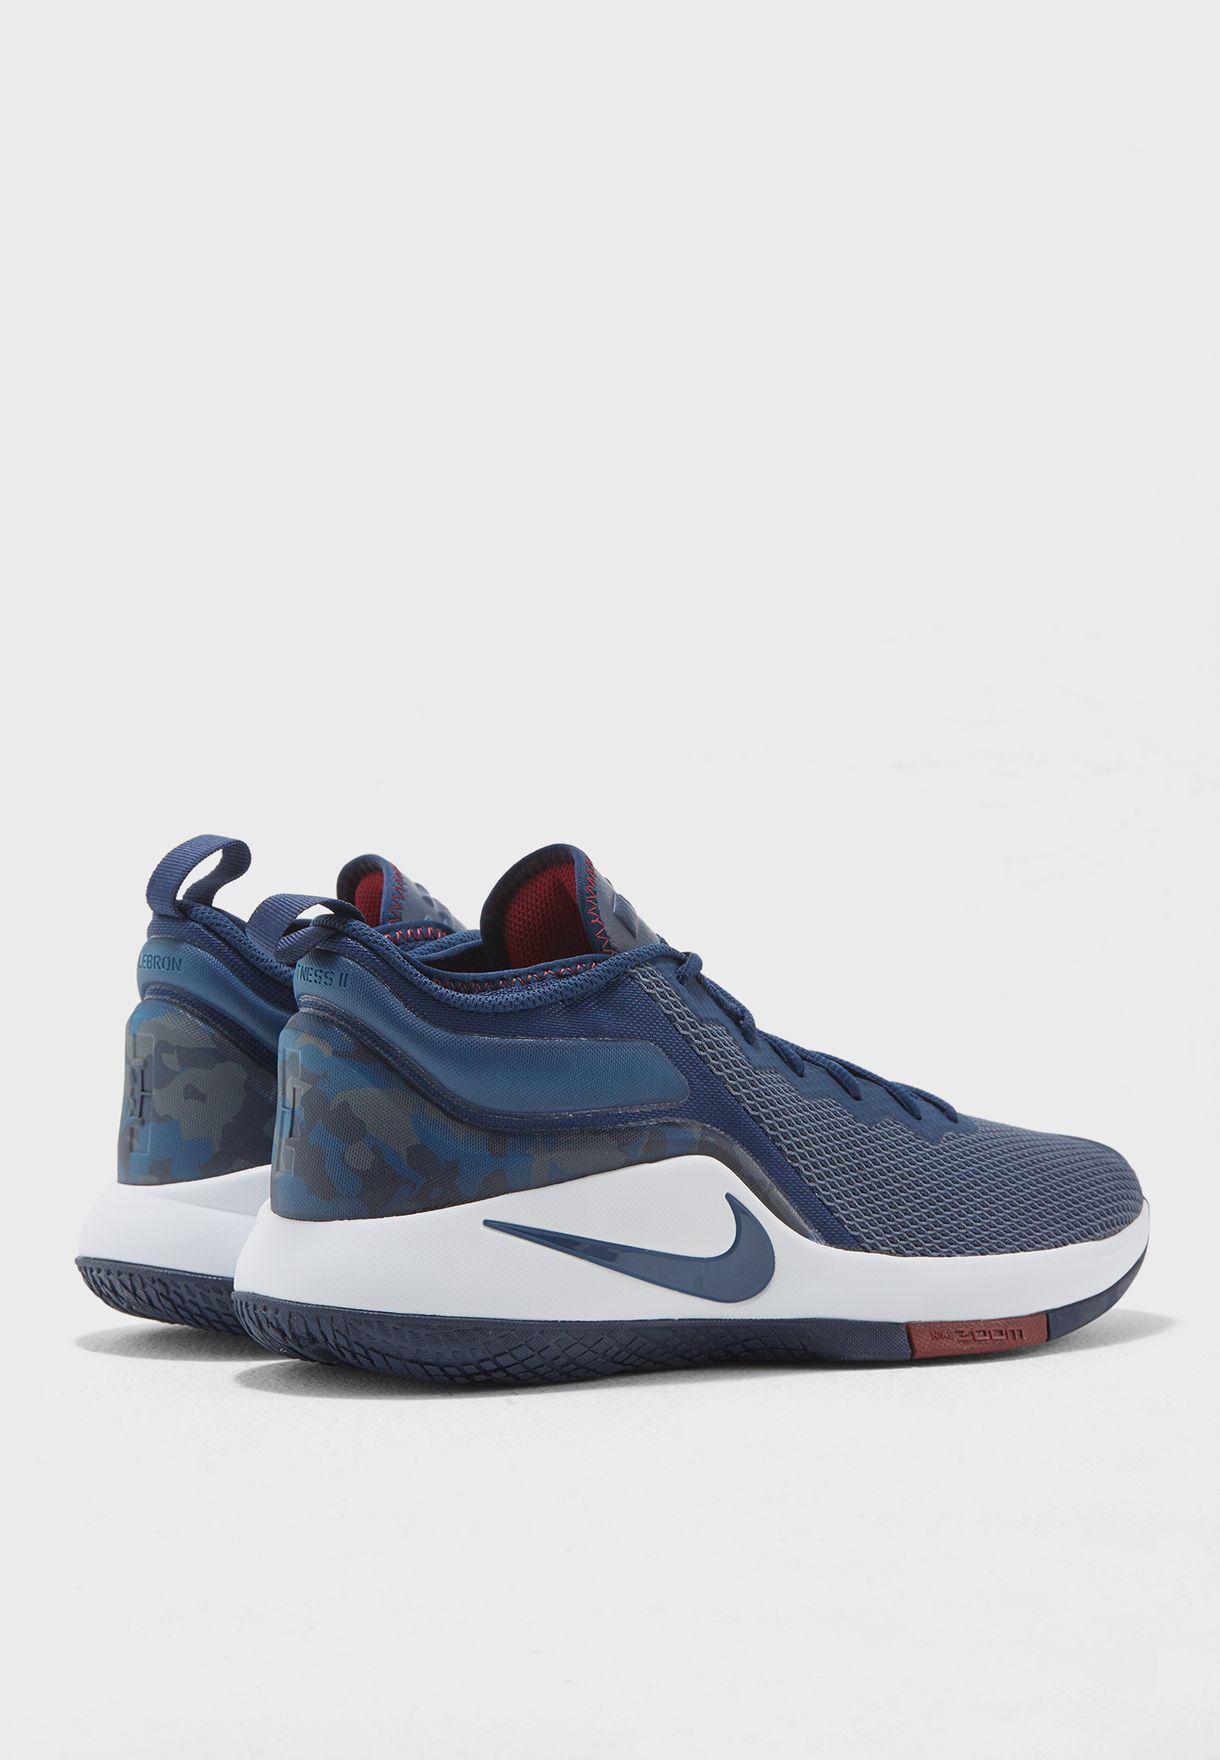 317e49157c9f3 Shop Nike navy LeBron Witness II 942518-406 for Men in UAE ...